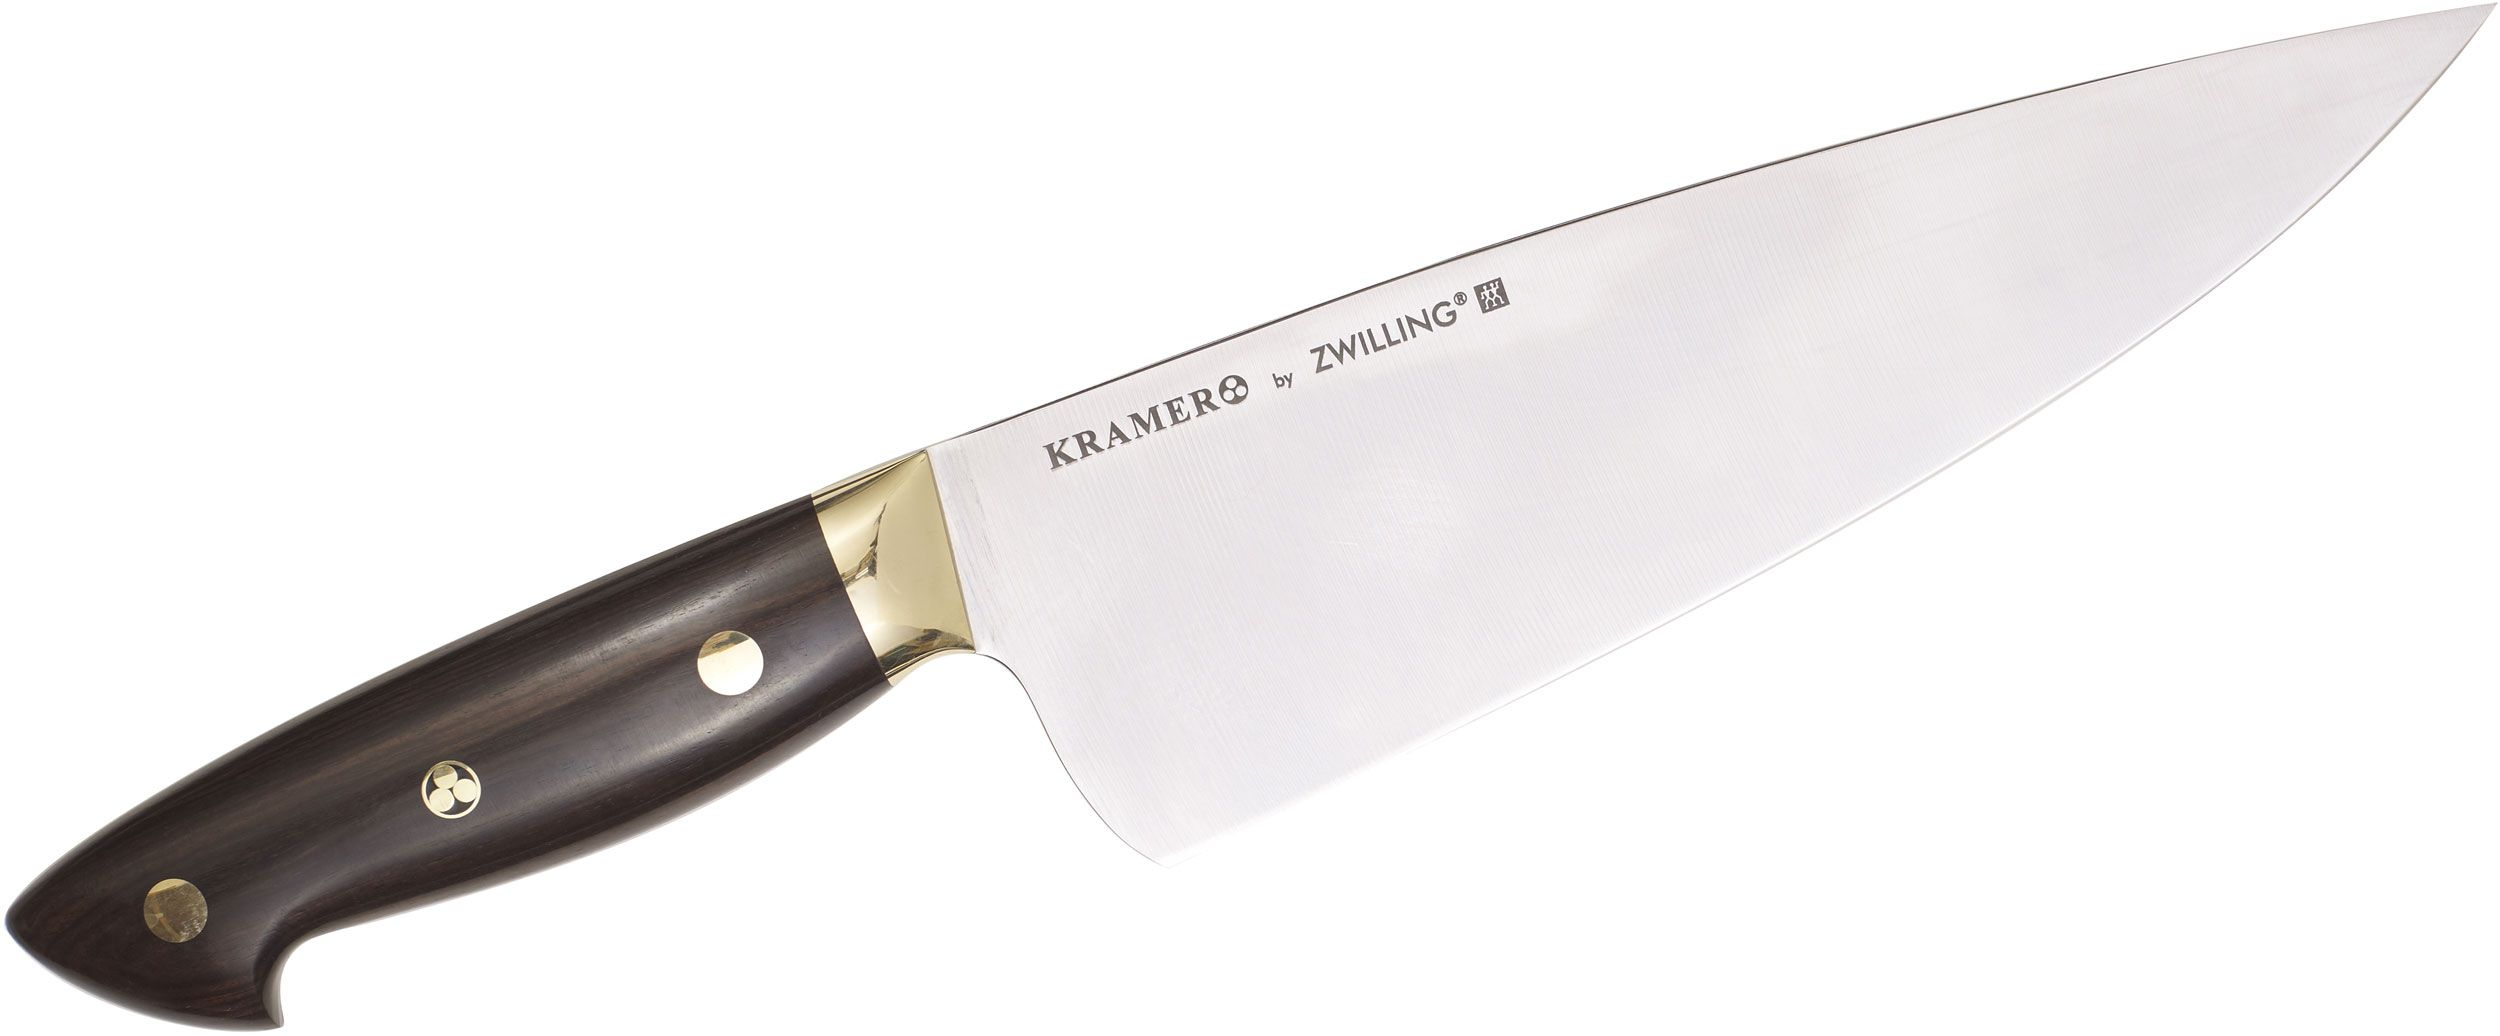 Zwilling J.A. Henckels EUROLine Bob Kramer 8 inch Chef's Knife, Grenadille Wood Handle